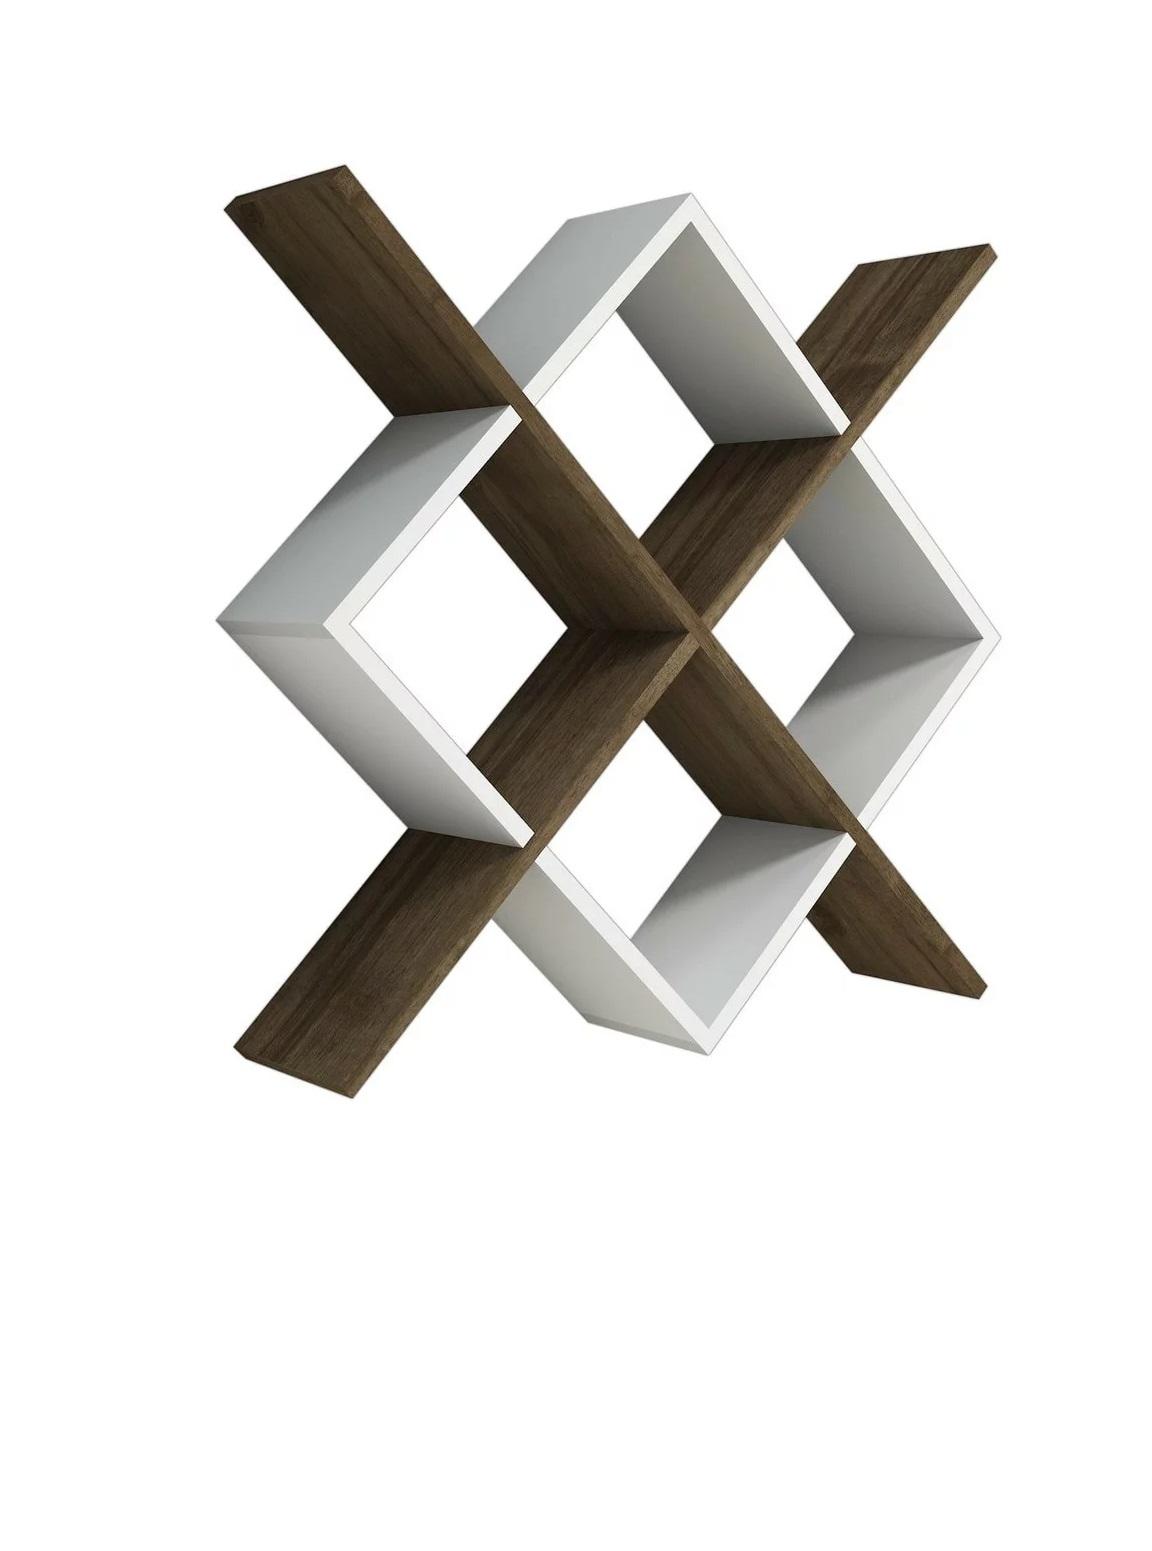 Raft de perete, Simina Homs, 79 x 79 x 20 cm, alb/nuc